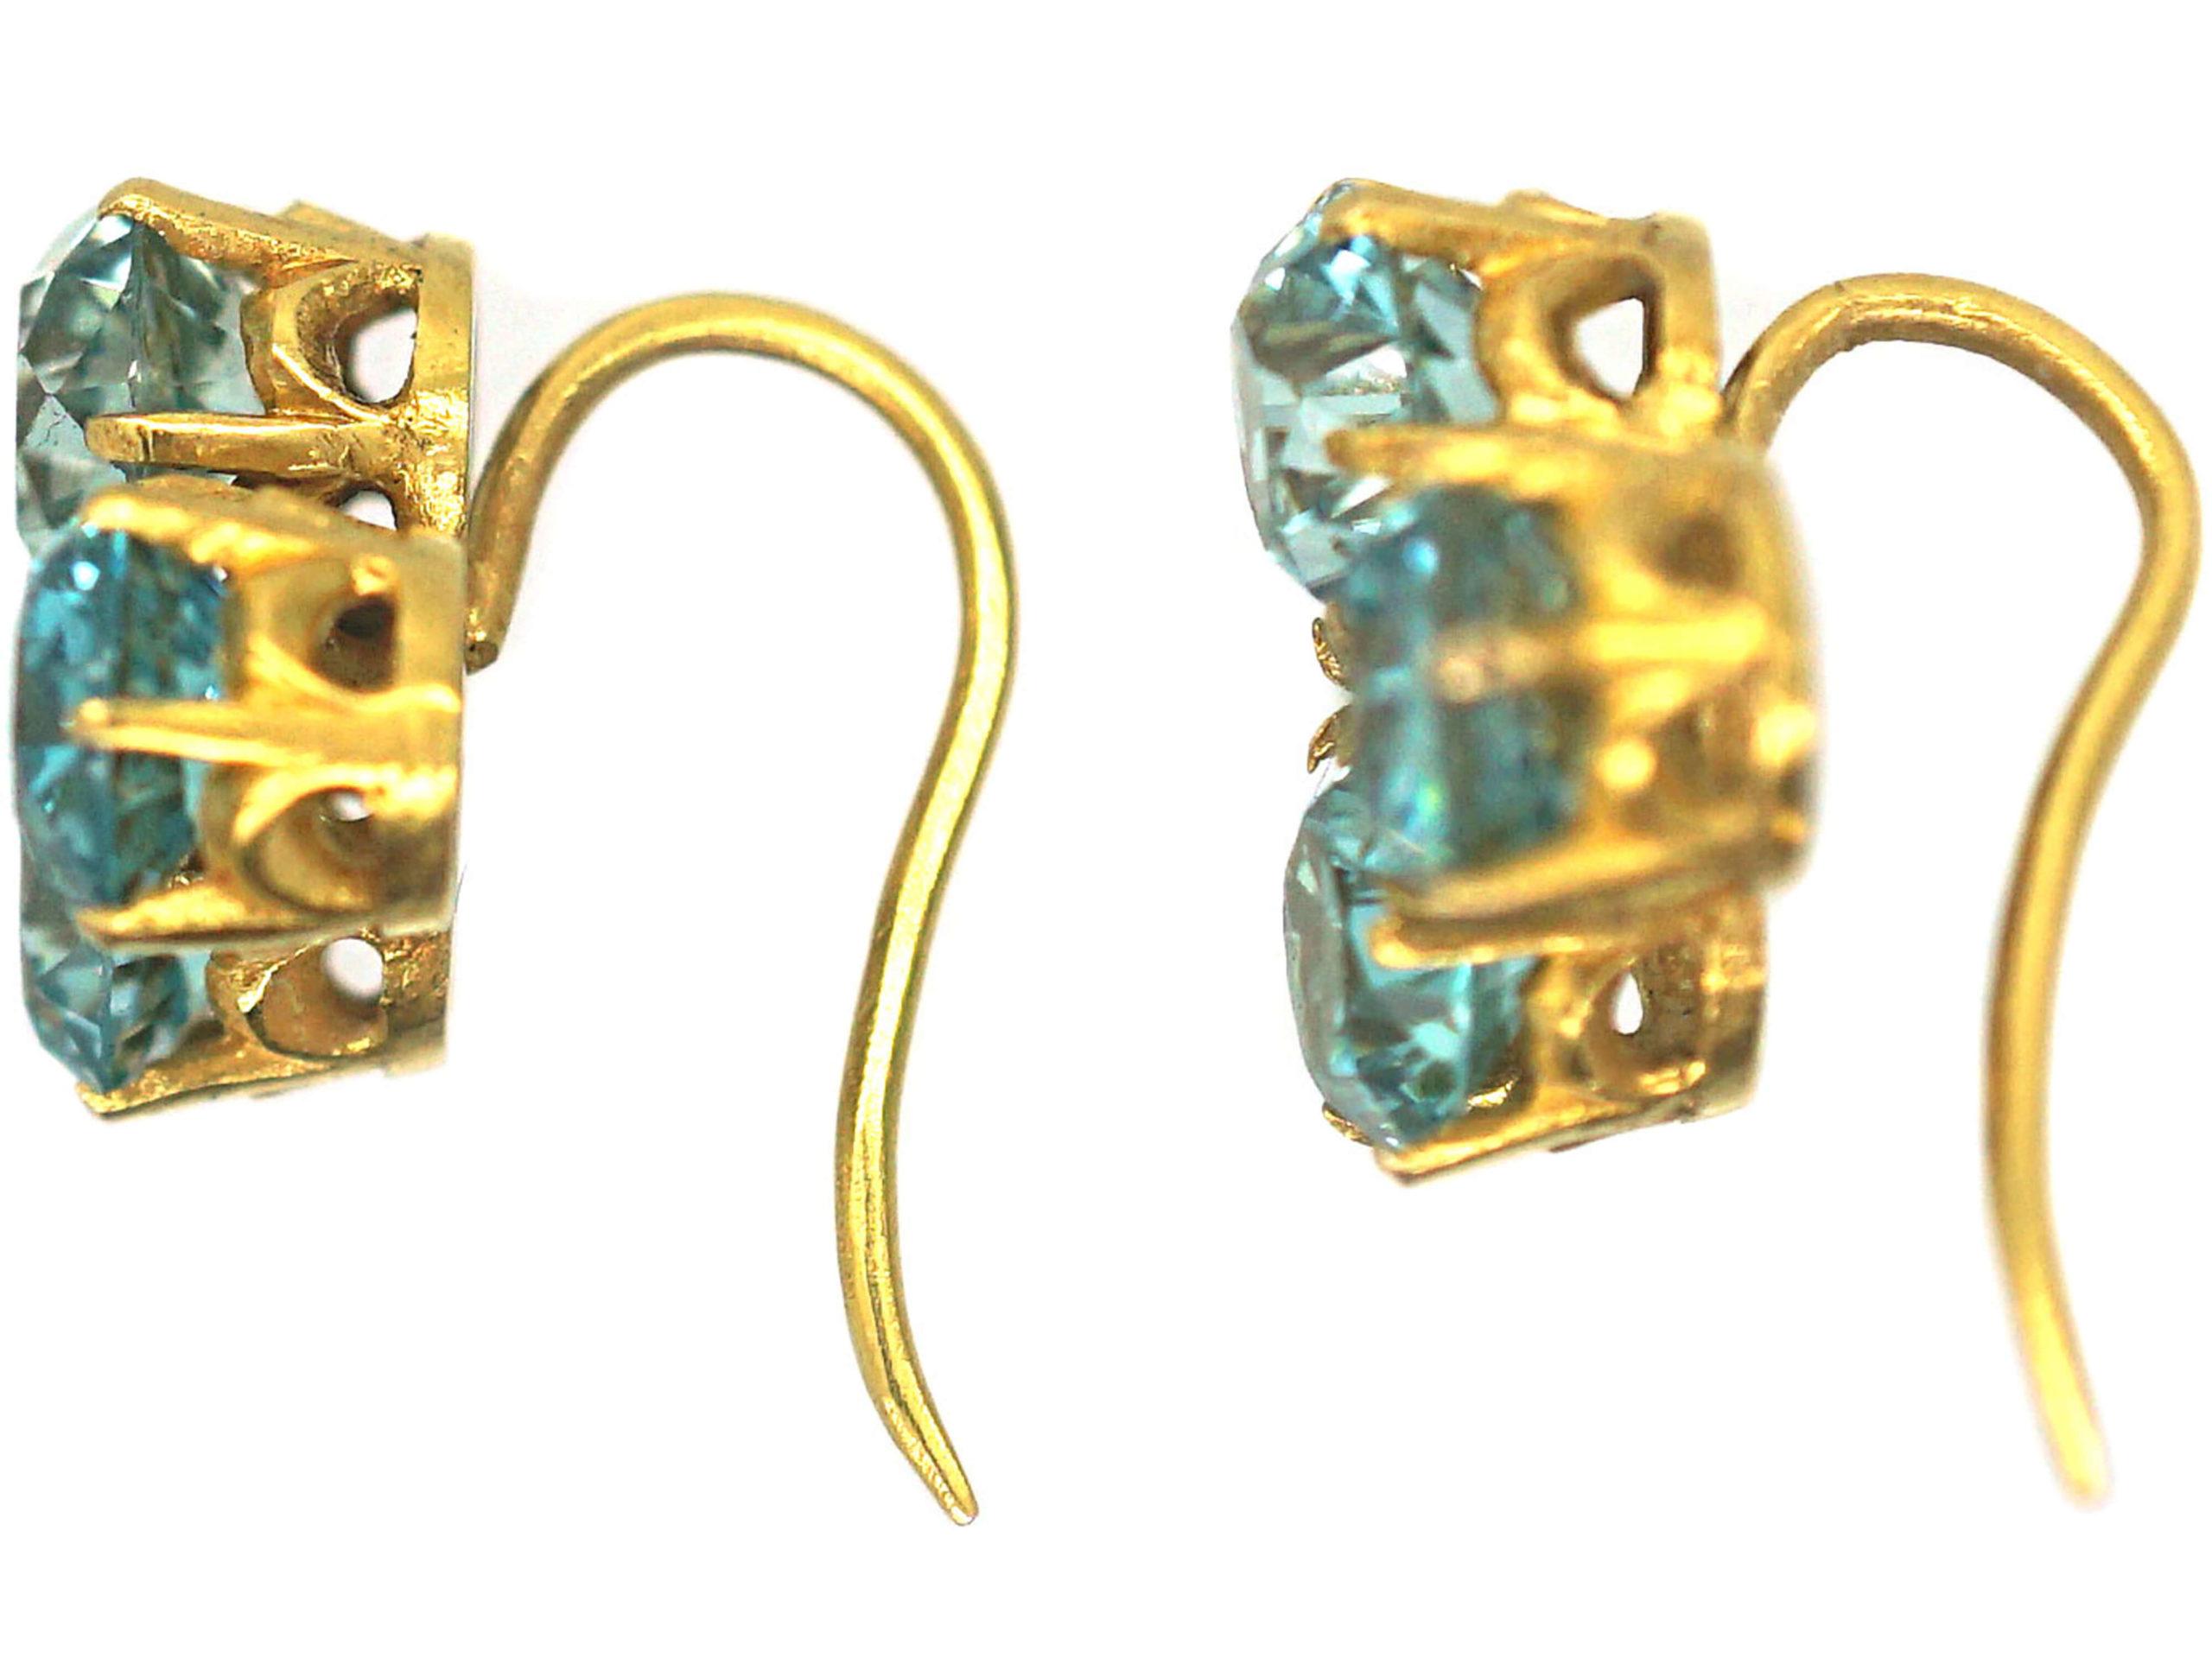 Art Deco 18ct Gold & Zircon Trefoil Design Earrings